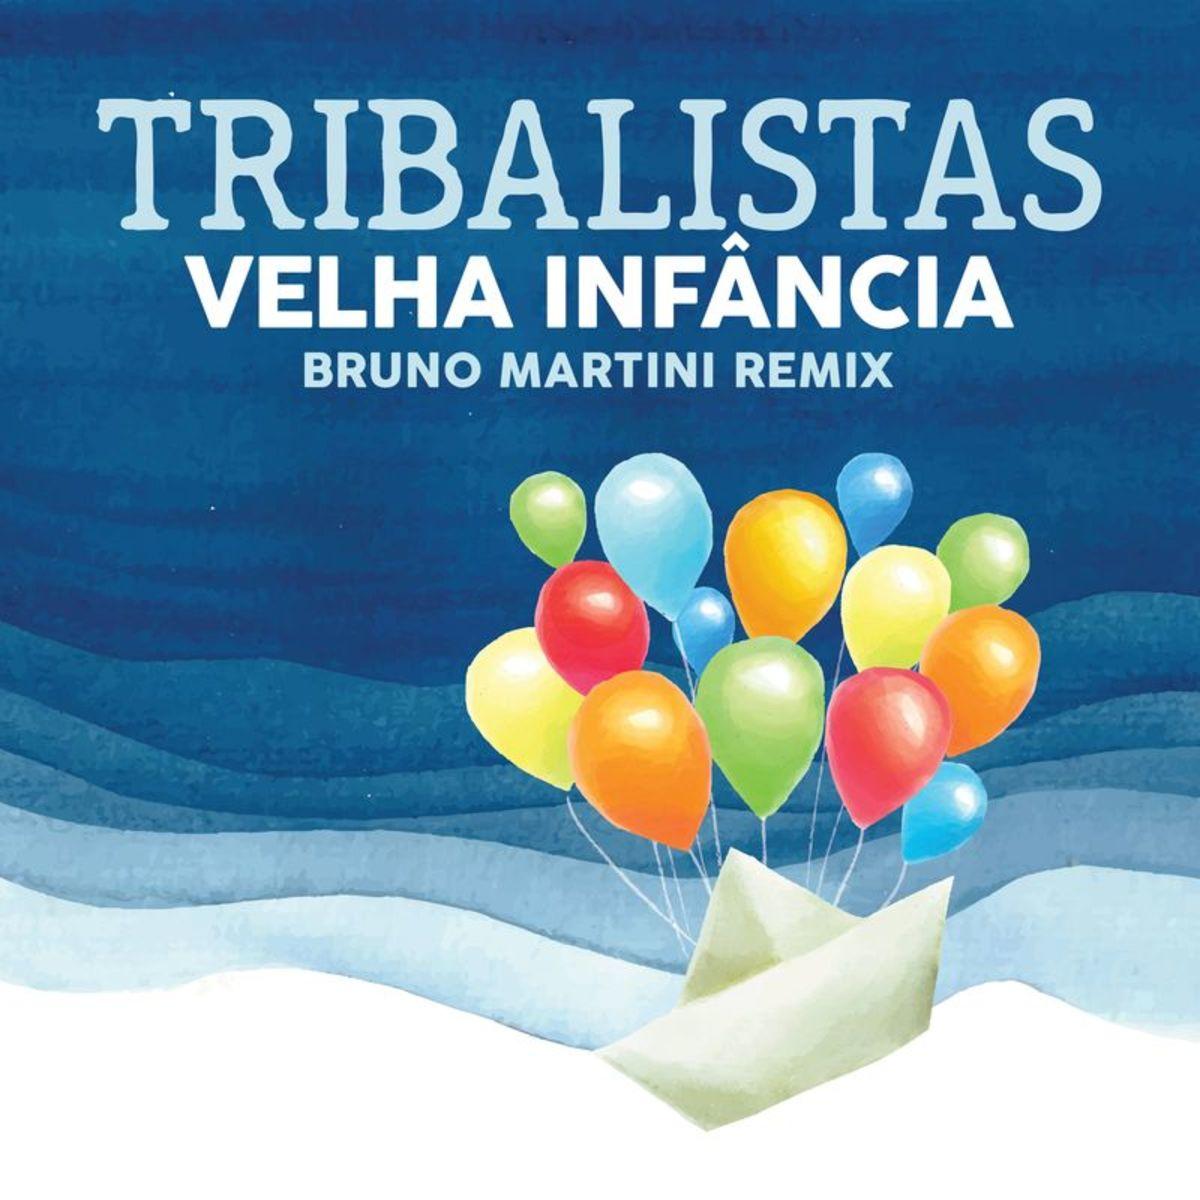 Tribalistas - Velha Infância (Bruno Martini Remix)